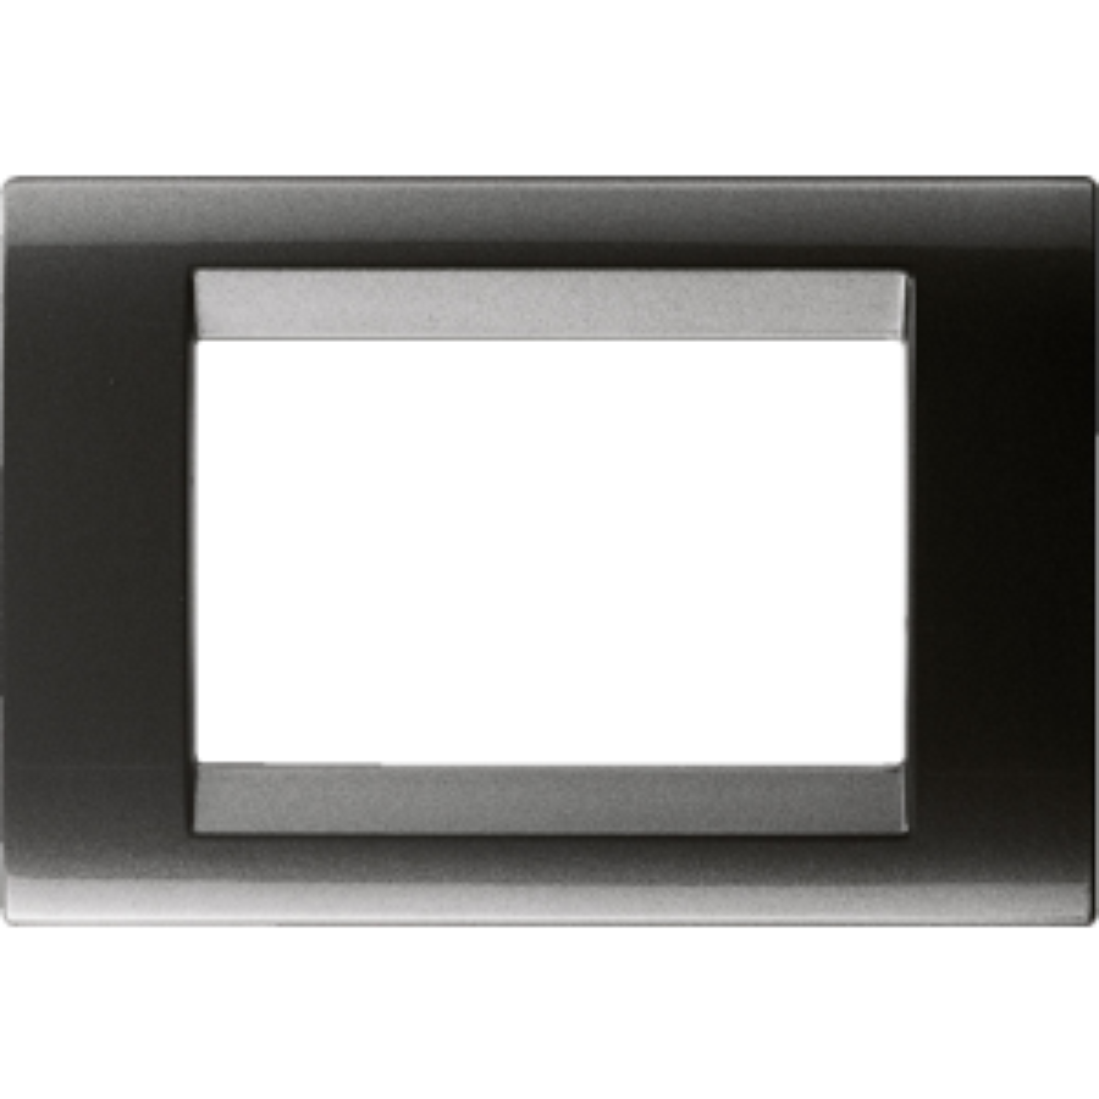 ARDESIA 6 POSTI GEWISS GW32006 PLACCA PLAYBUS IN TECNOPOLIMERO VERNICIATO